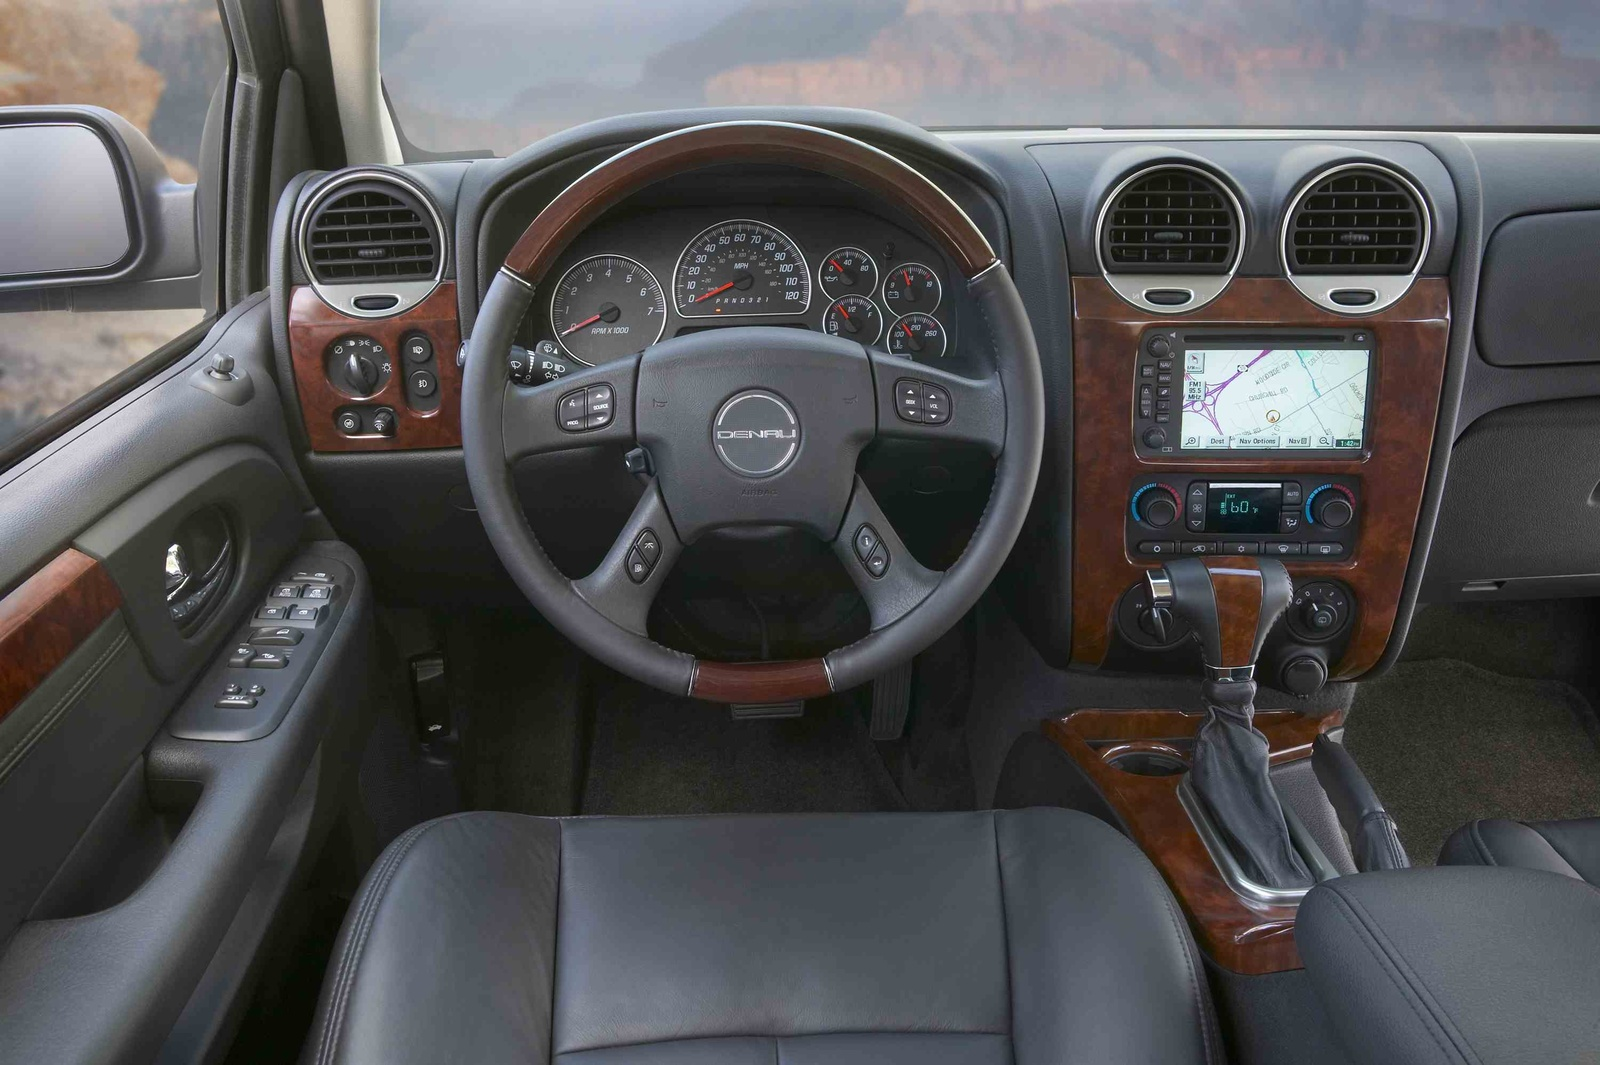 Gmc Envoy Denali Picture 8 Reviews News Specs Buy Car